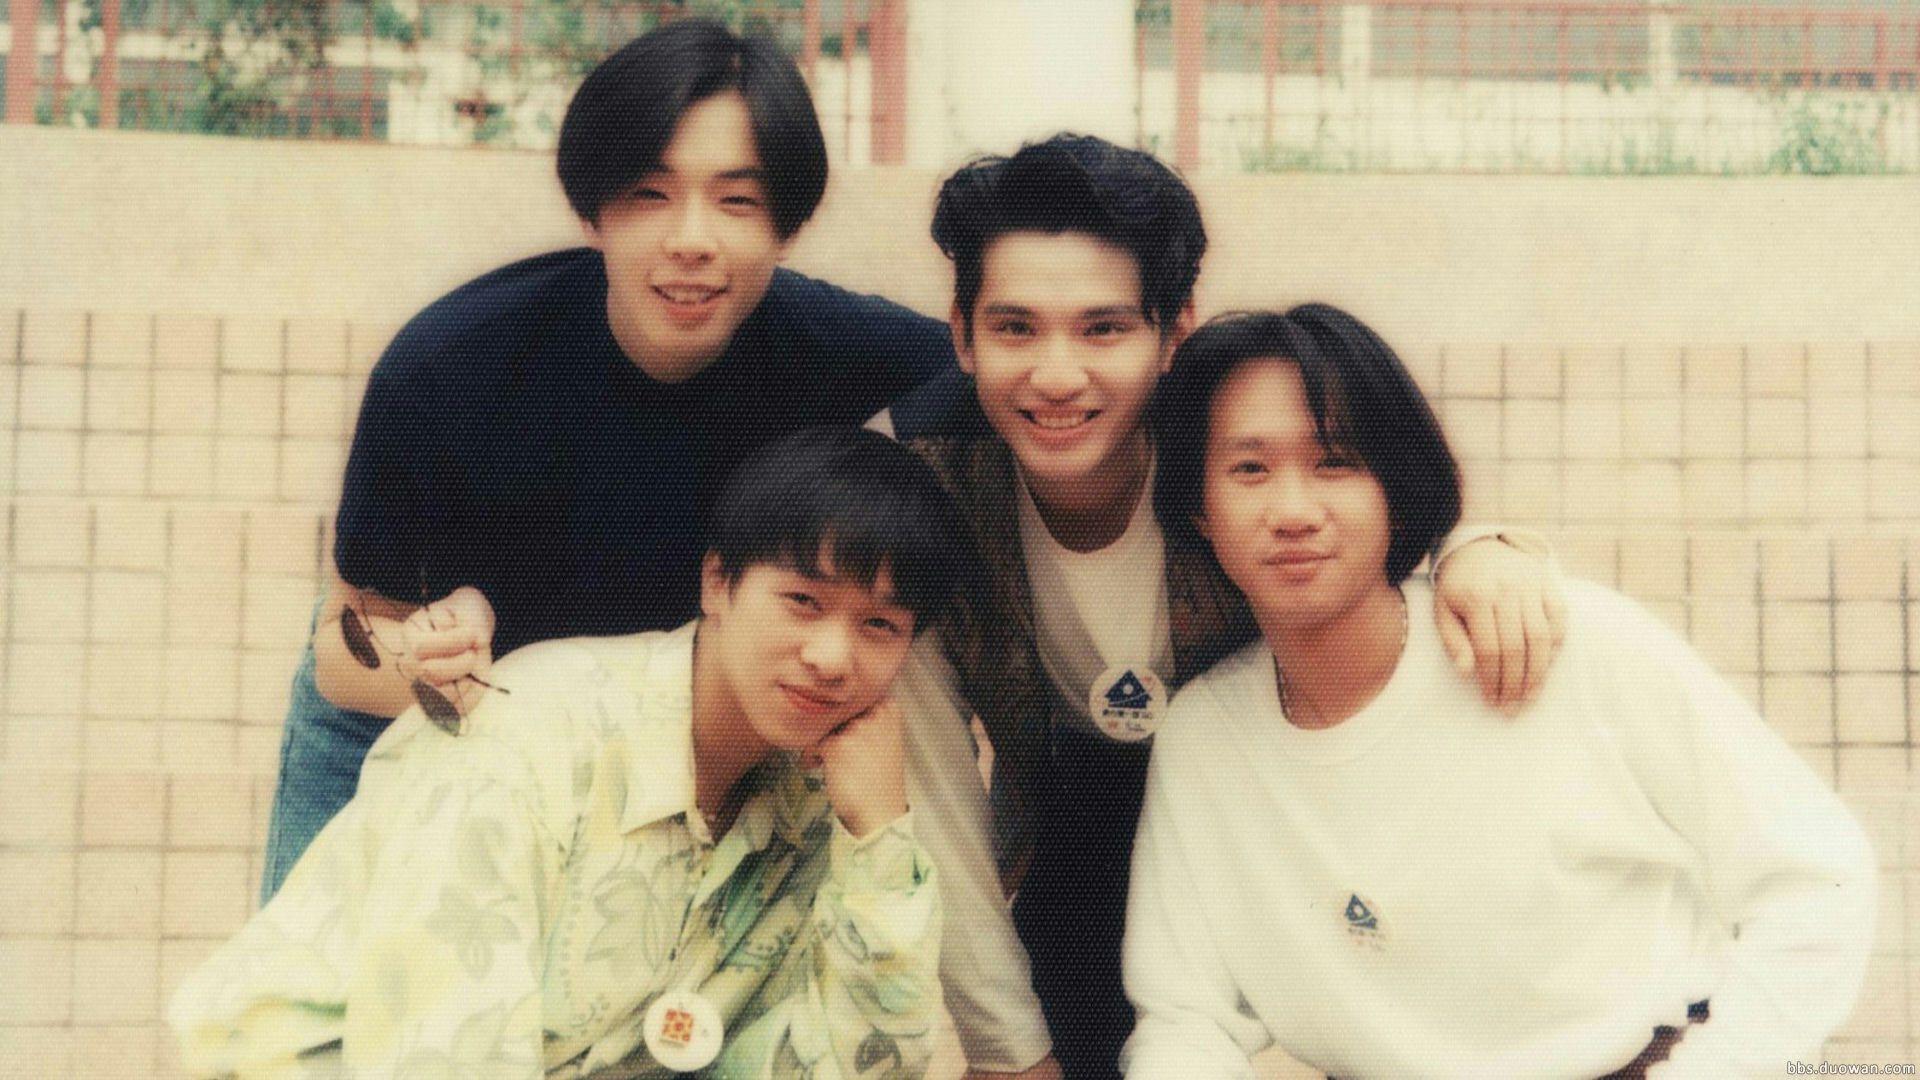 Beyond無損合集 (1986-2003) [WAV/APE 整軌+CUE]